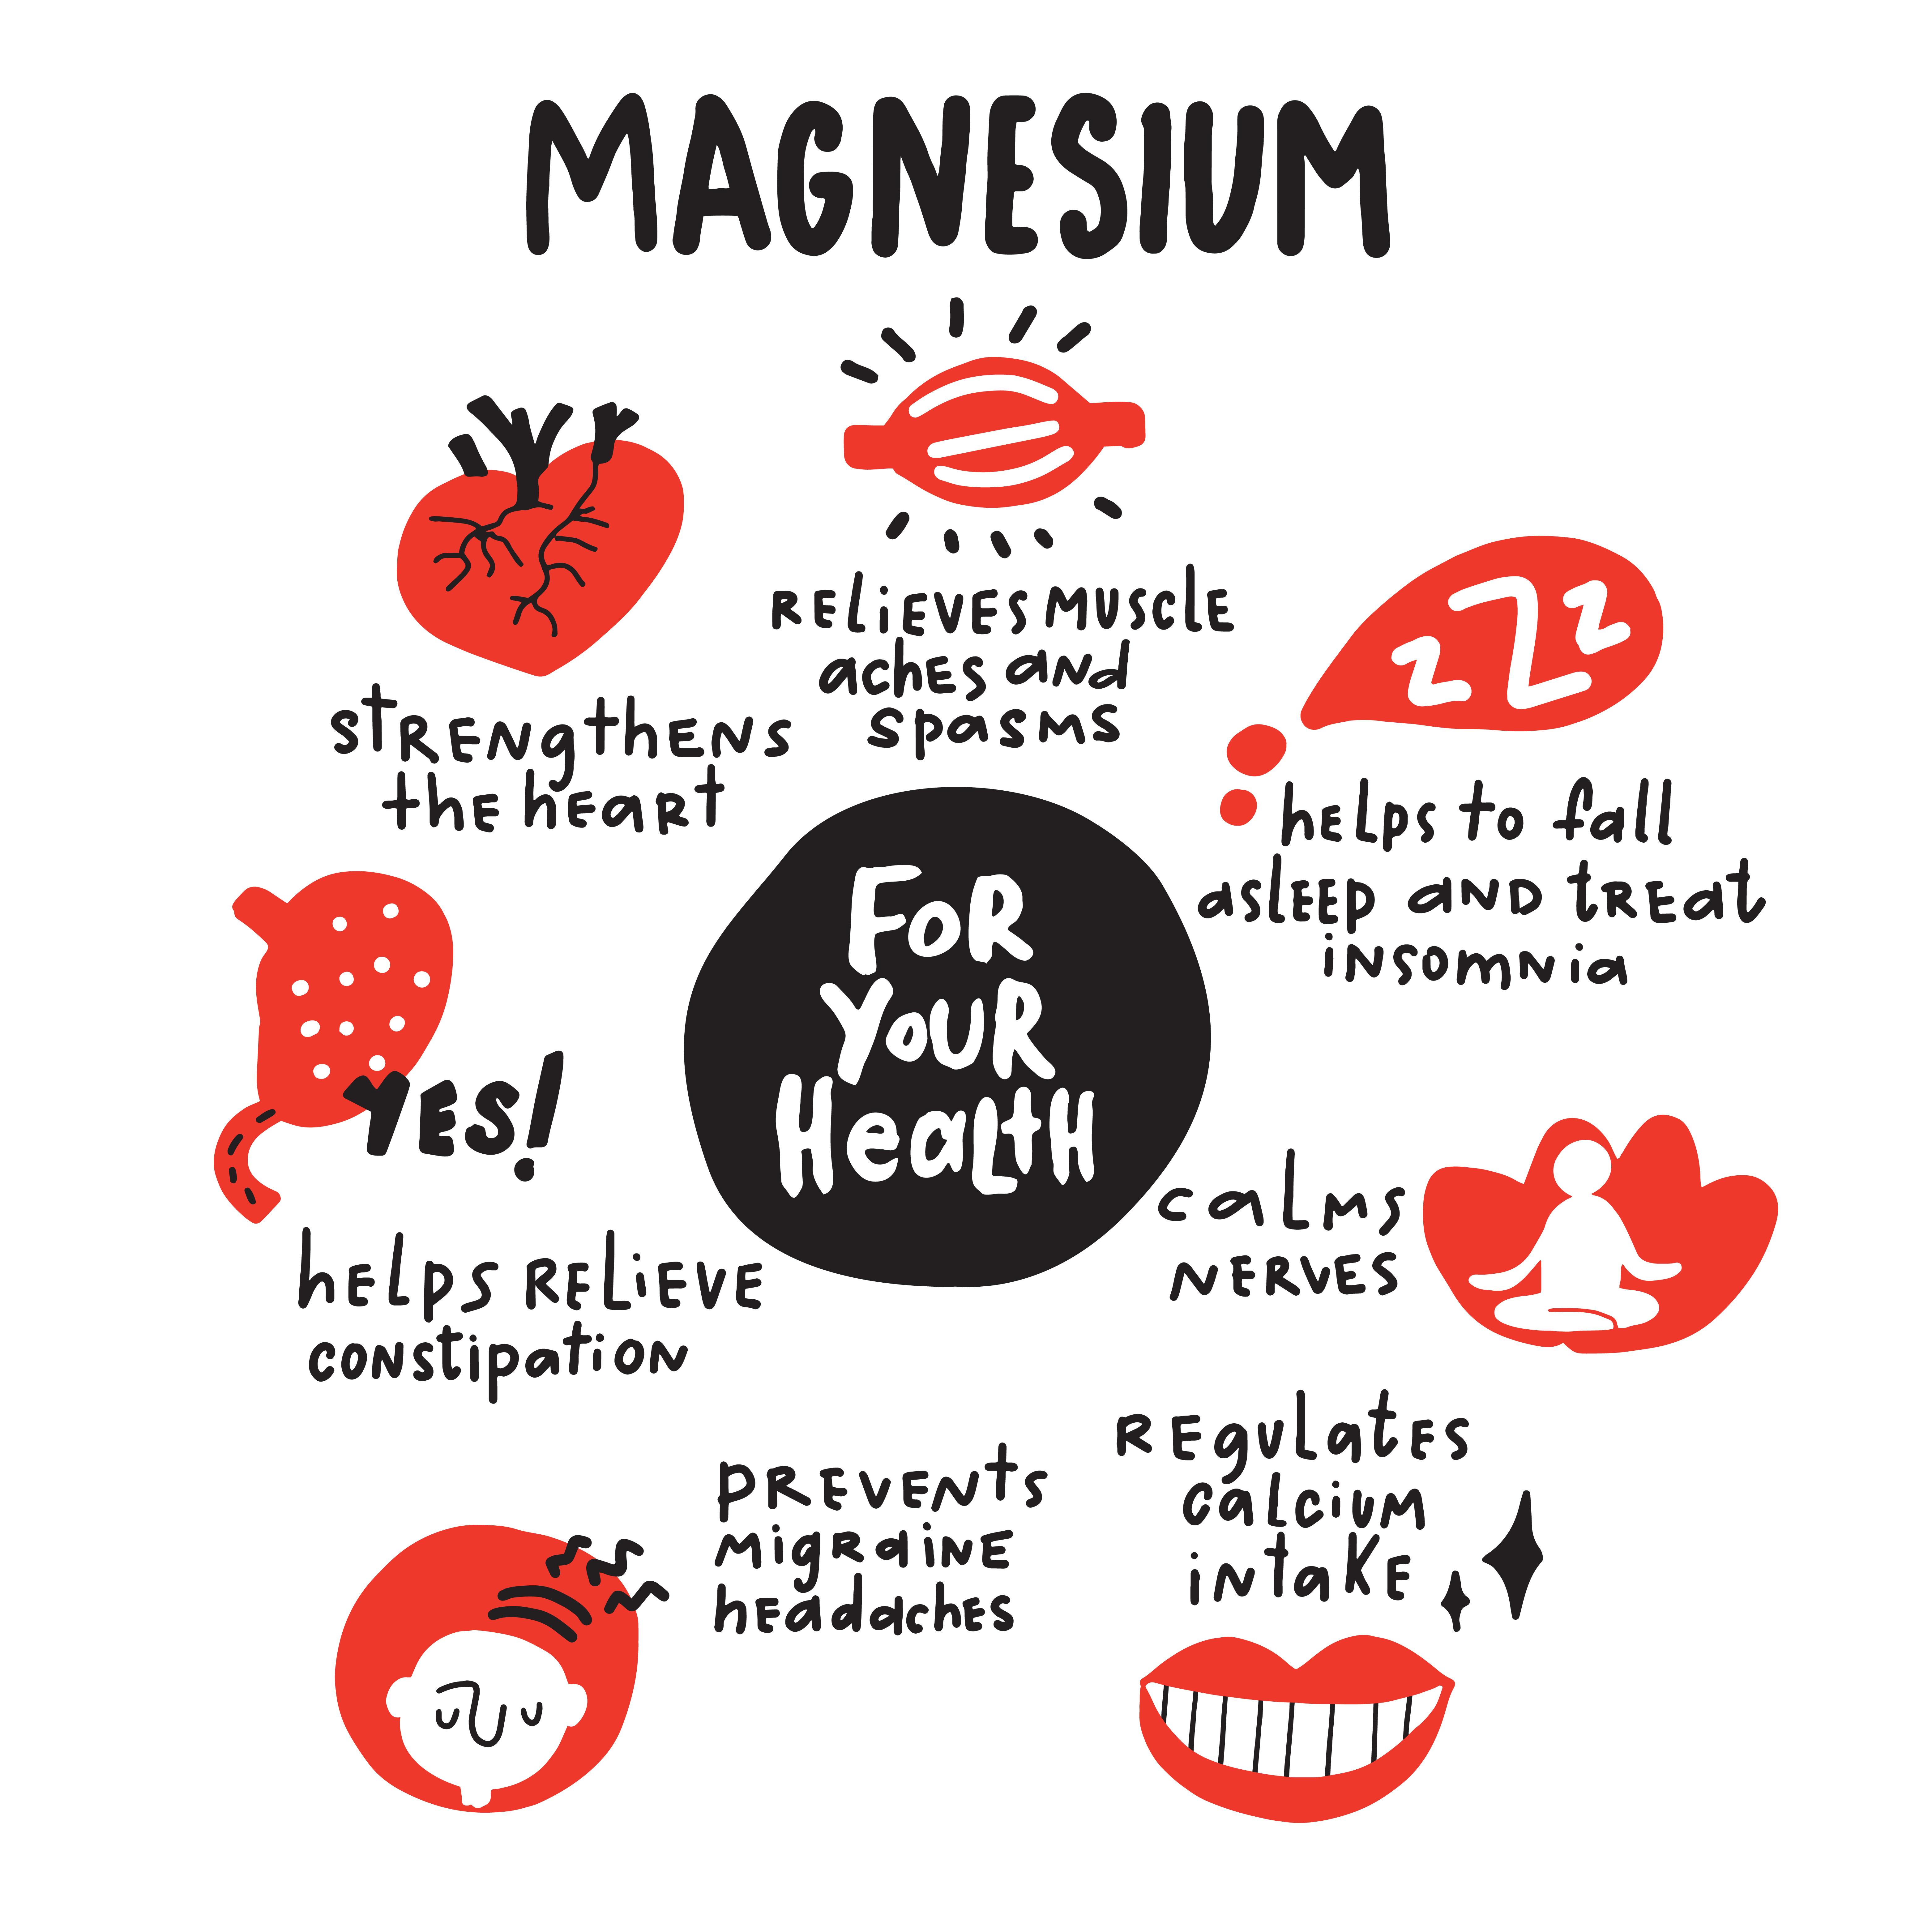 Qucik brief of magnesium benefits and actions